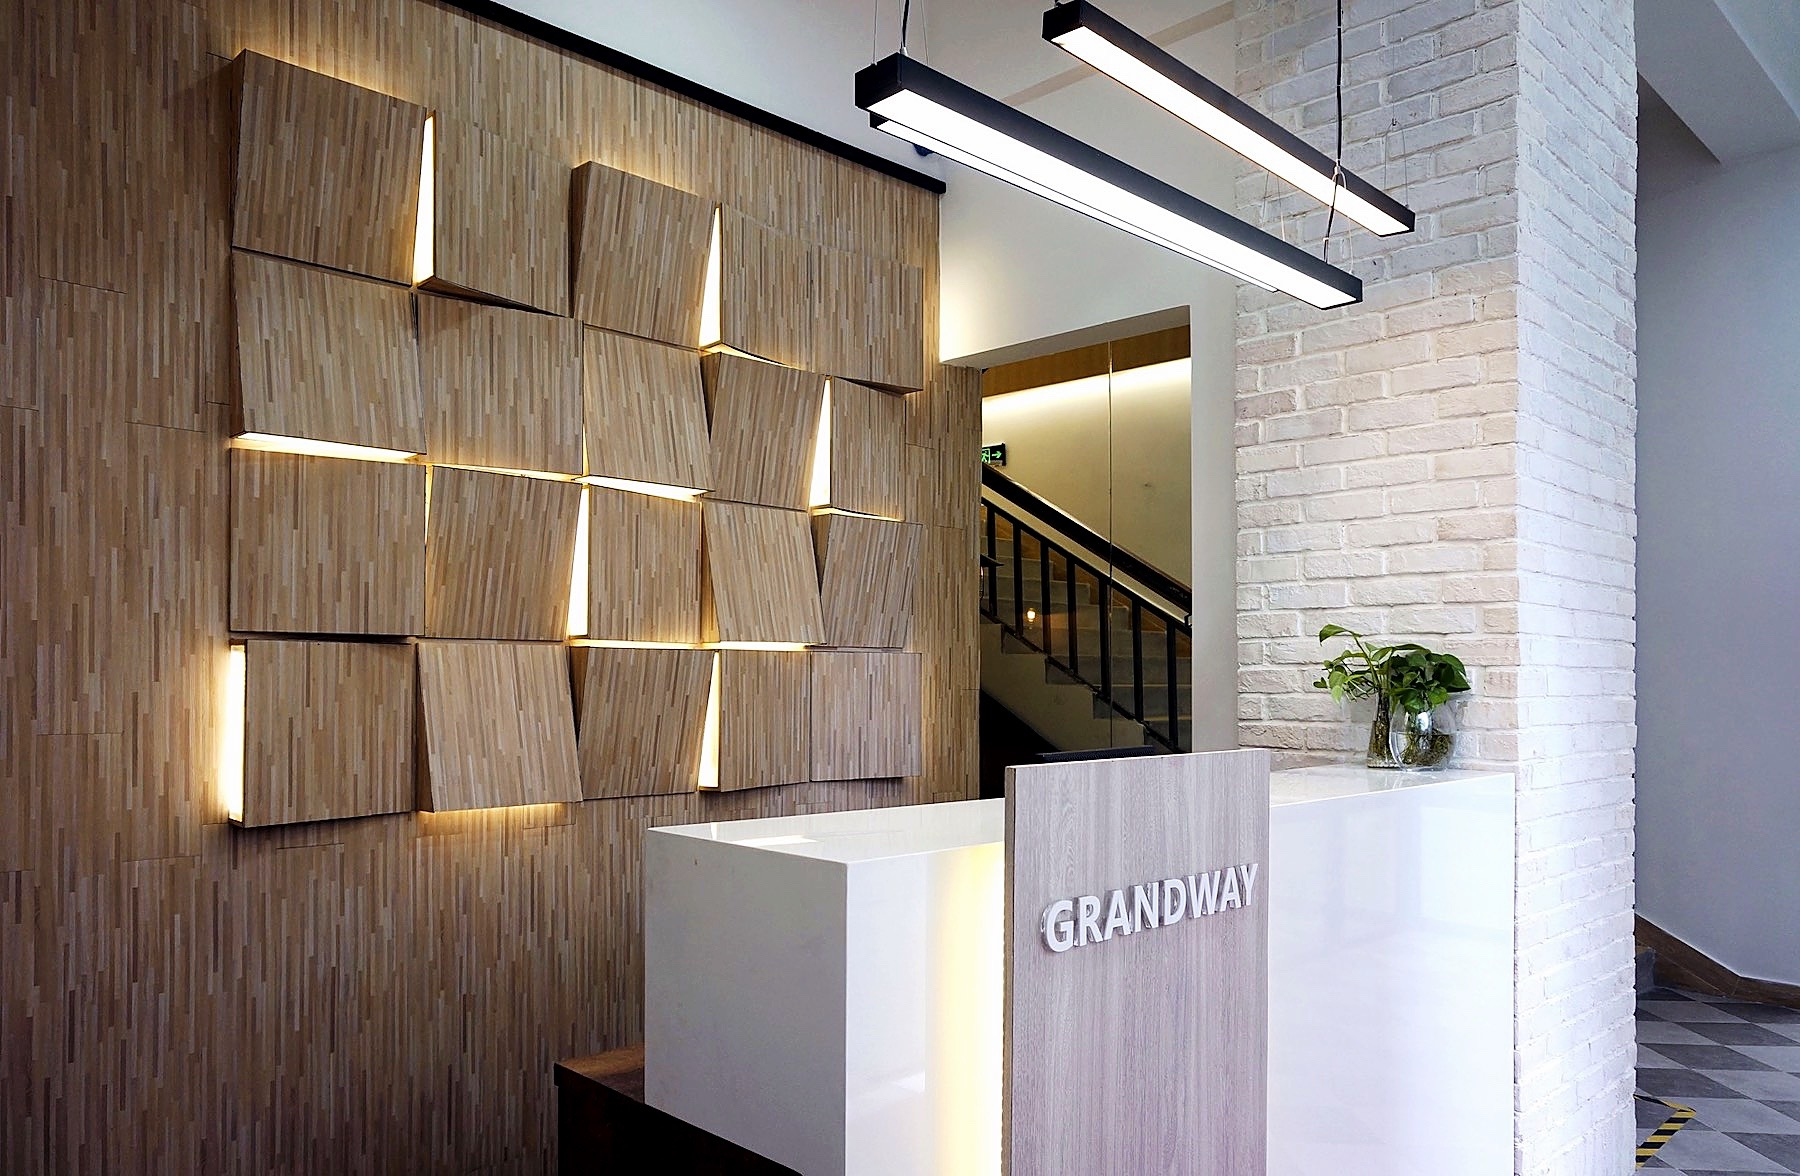 Grandway Office Renovation 2018 Reception 005